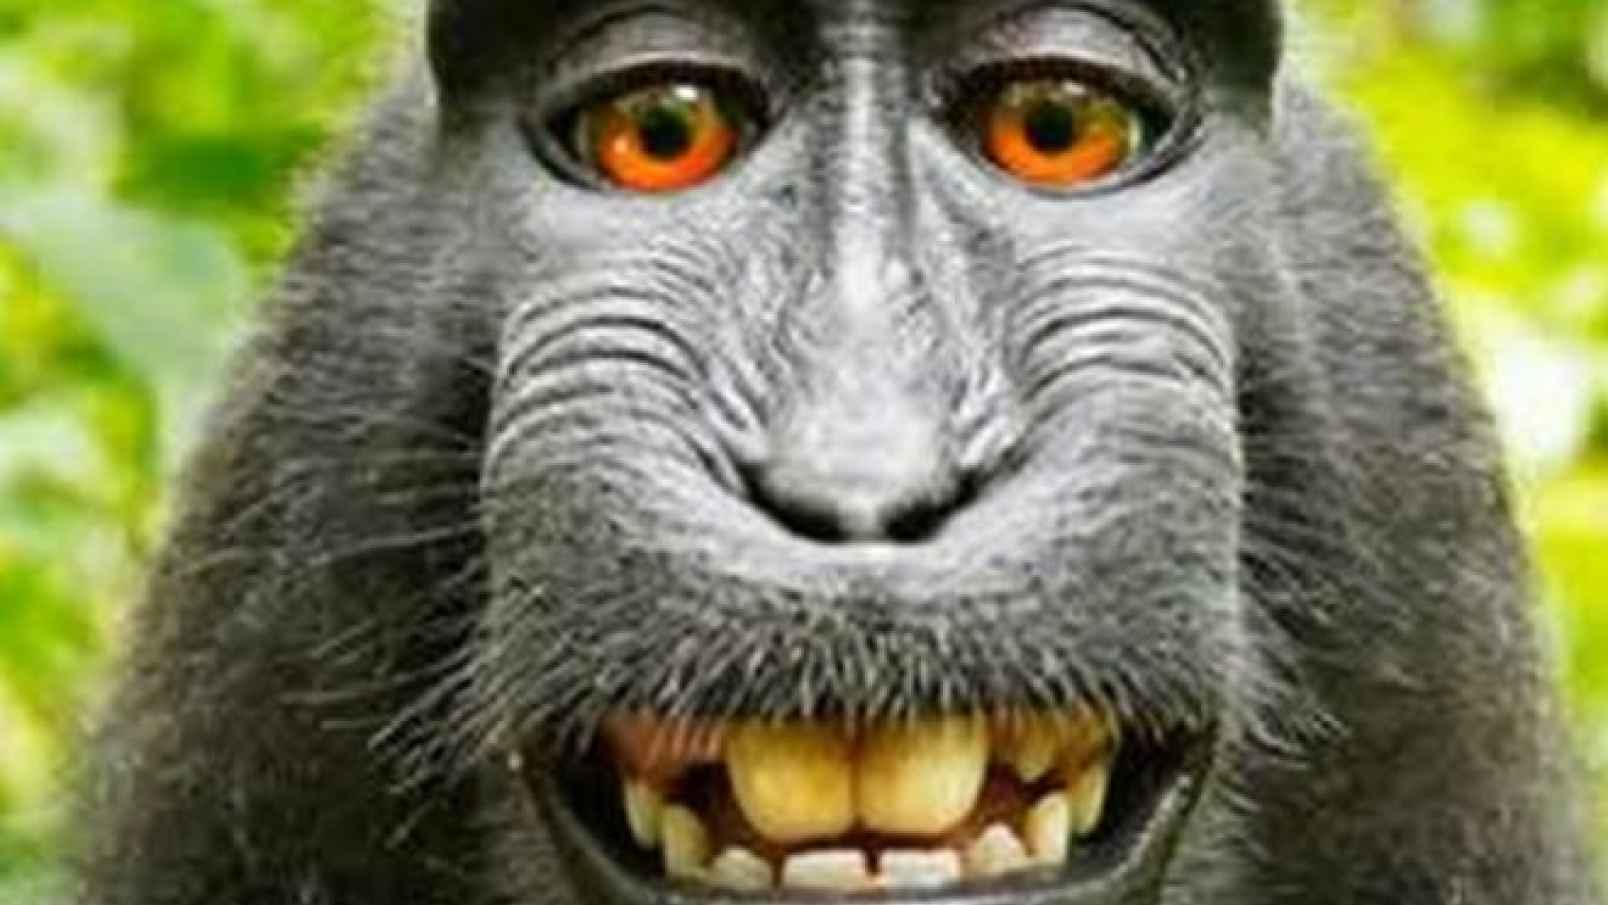 Monkey citizens